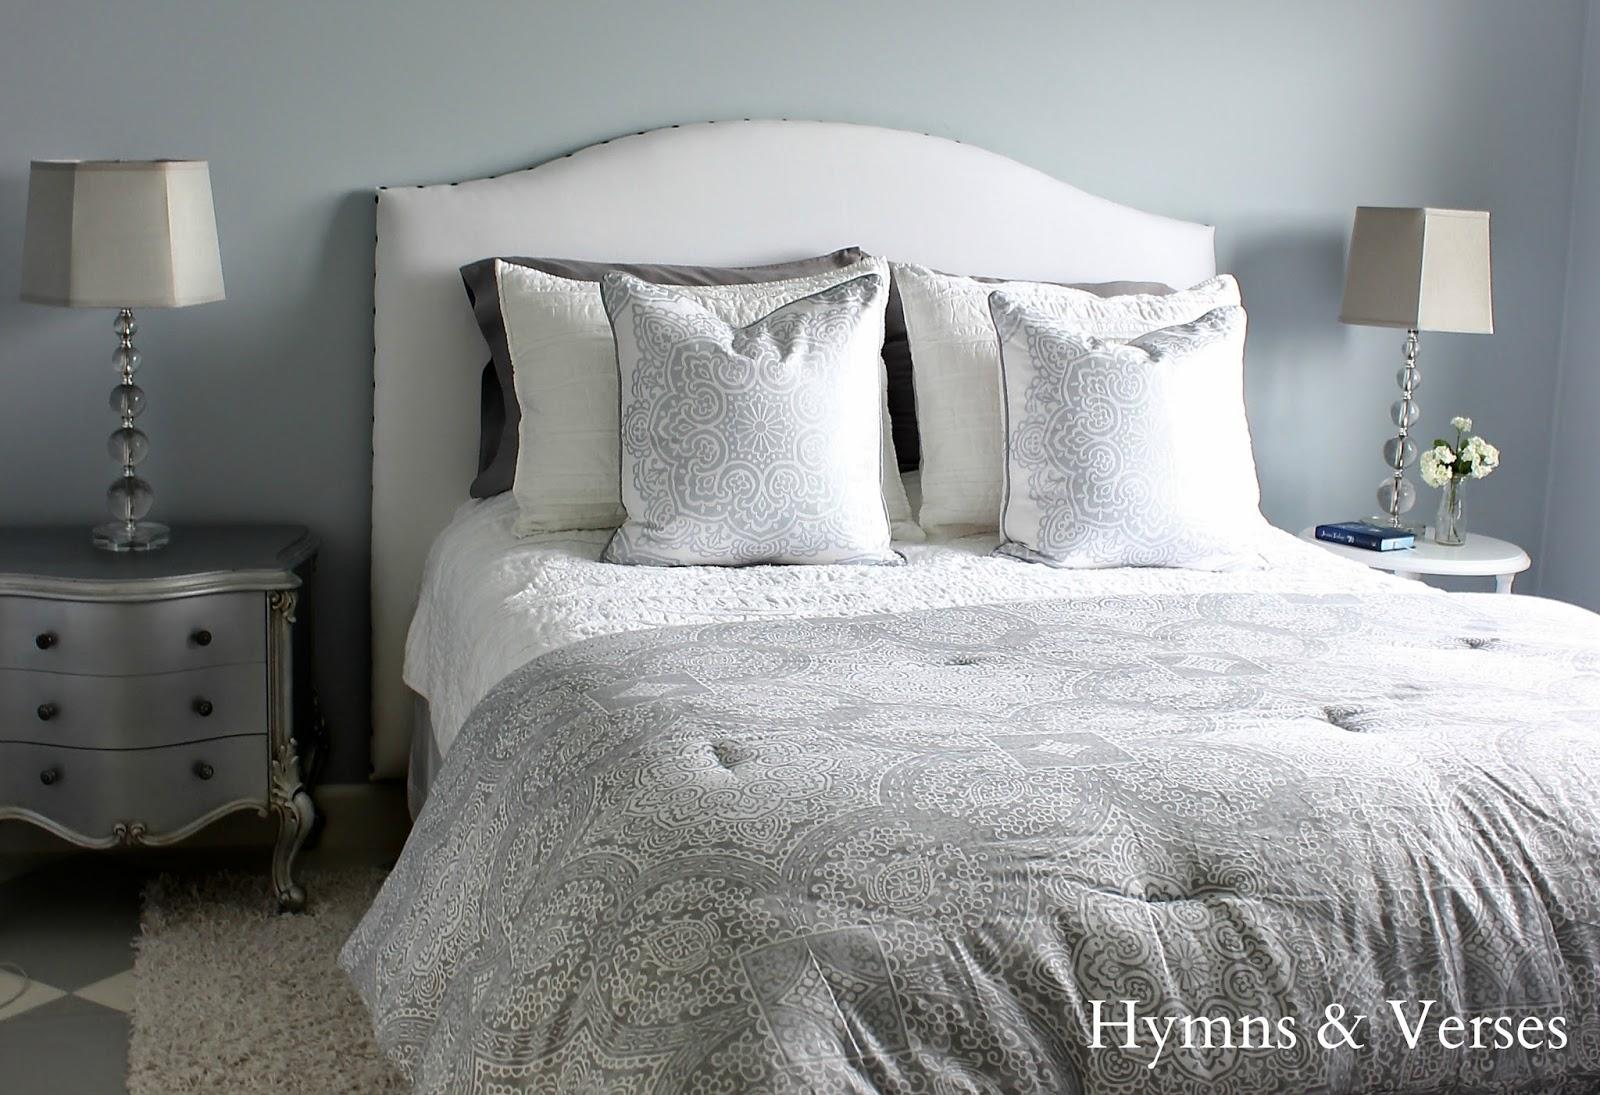 Hymns And Verses Diy Upholstered Headboard Tutorial